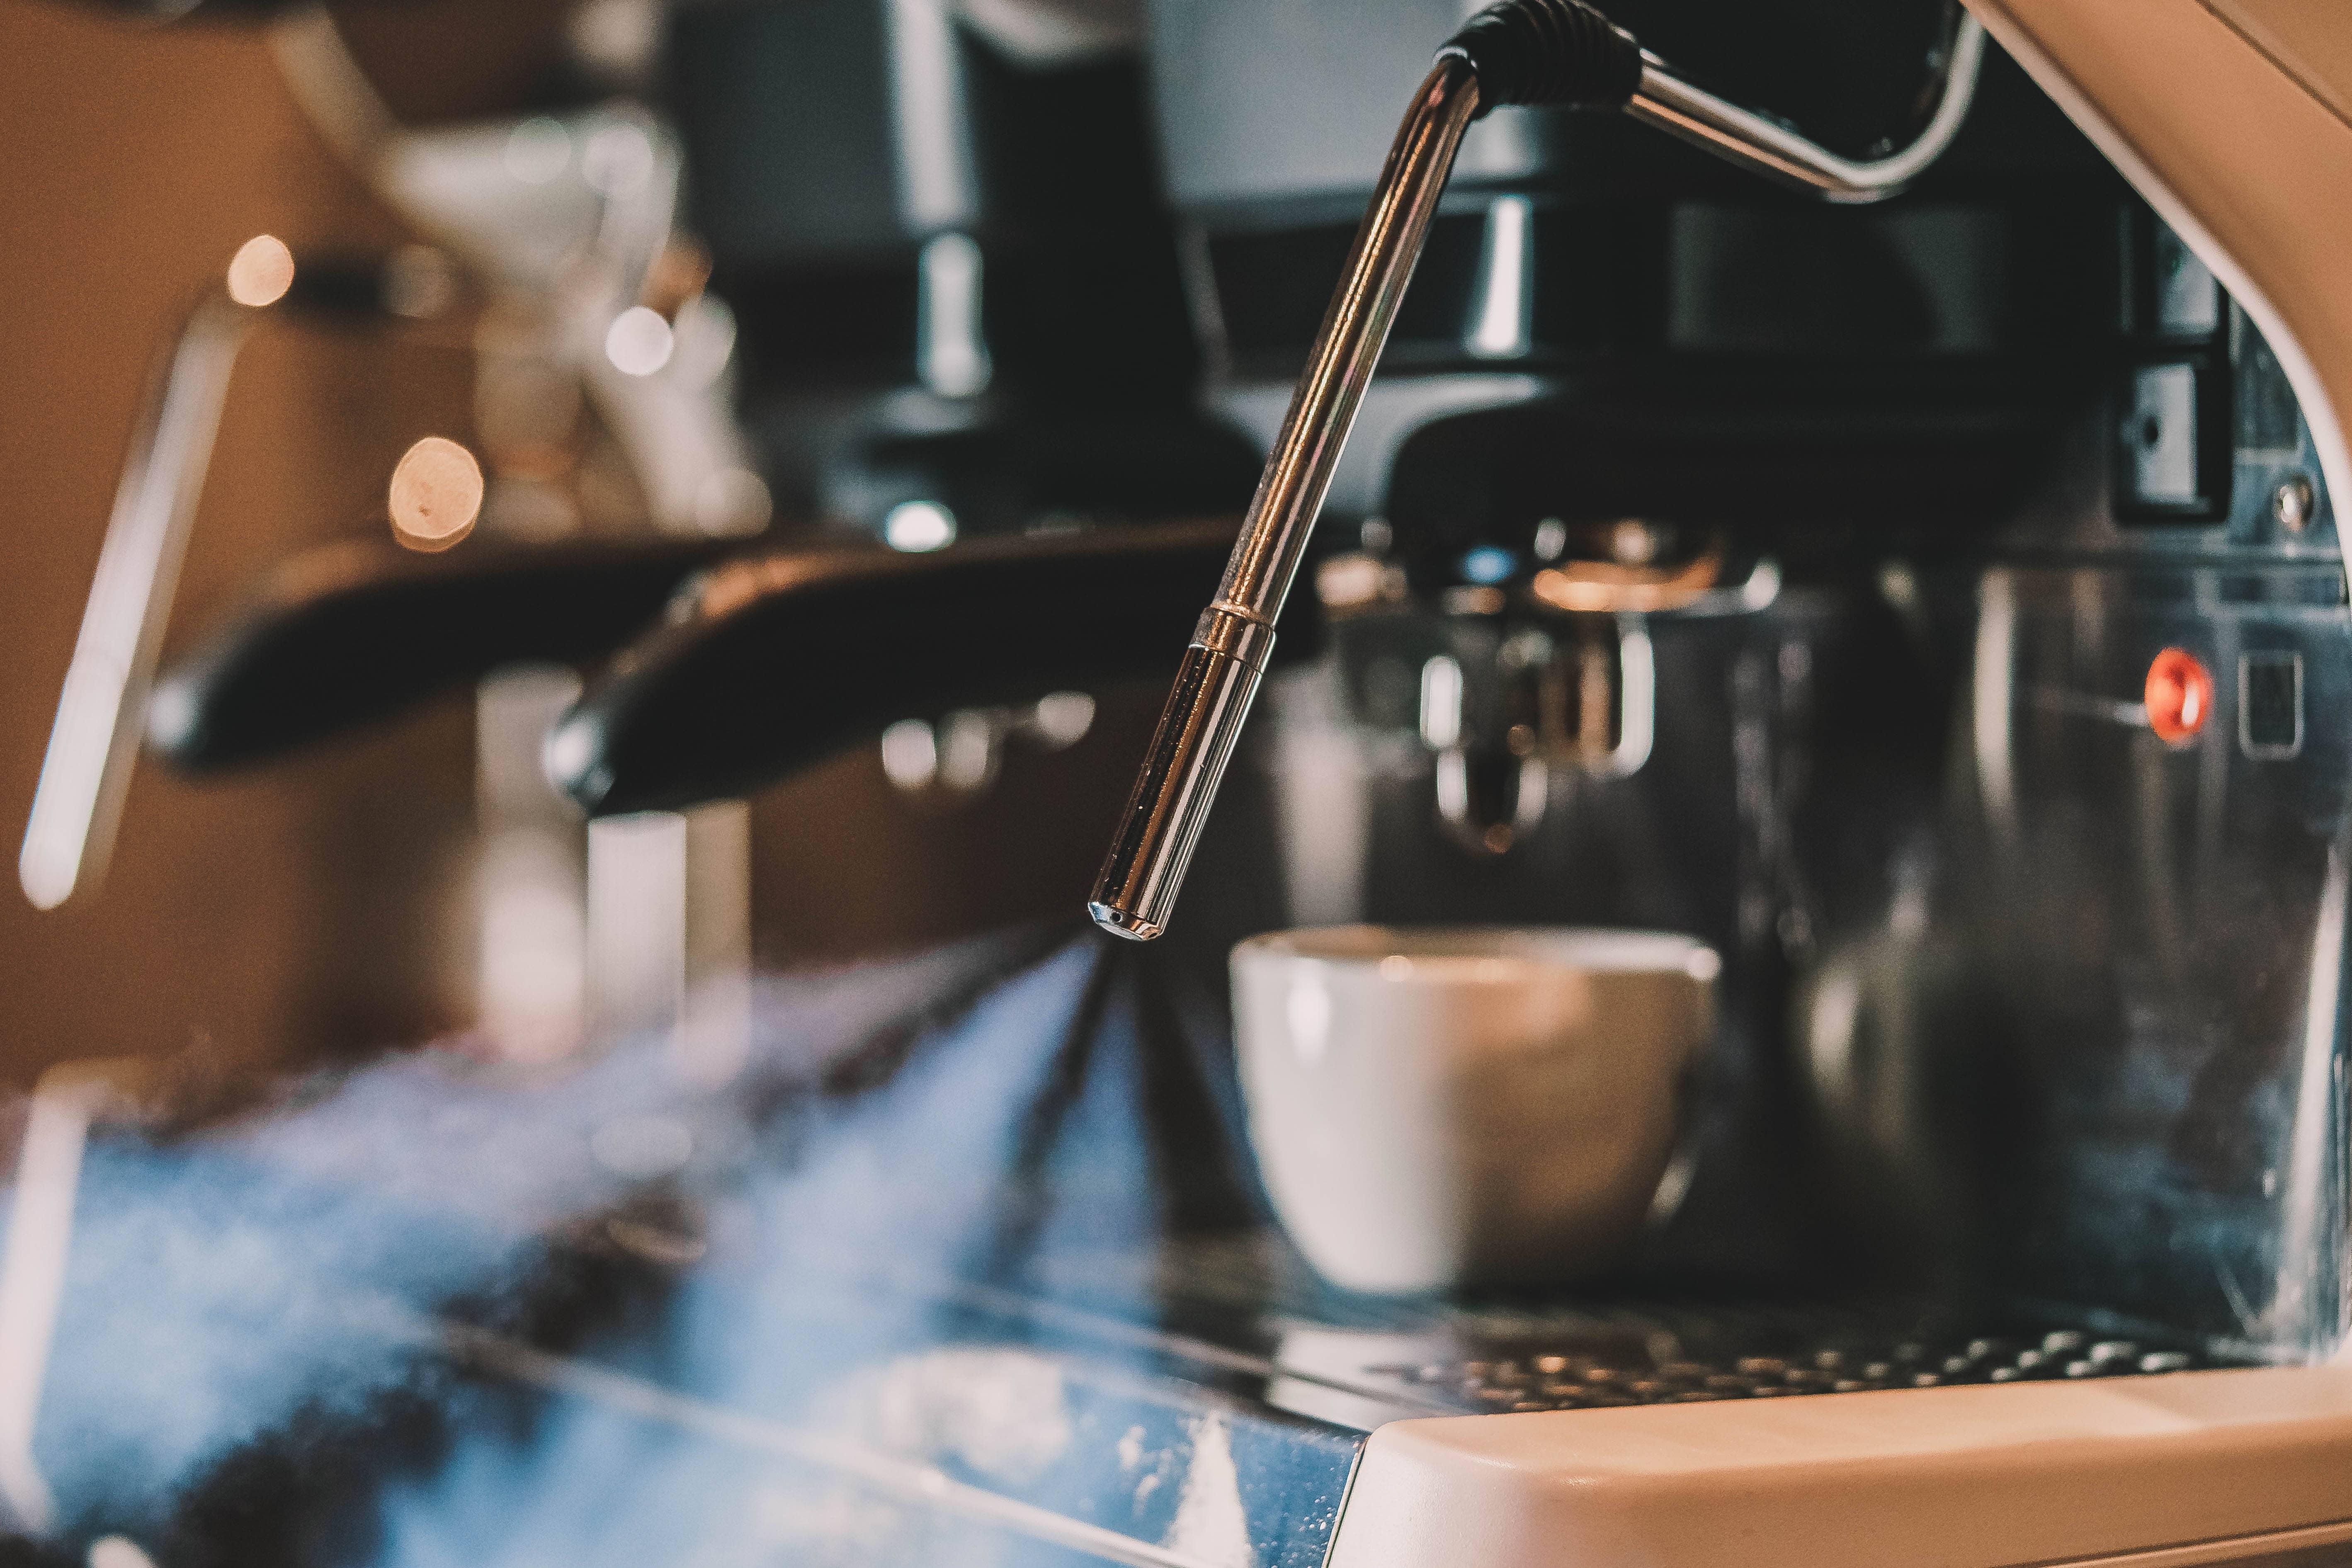 Gustos Barista Classes - Basics of Milk Steaming 5